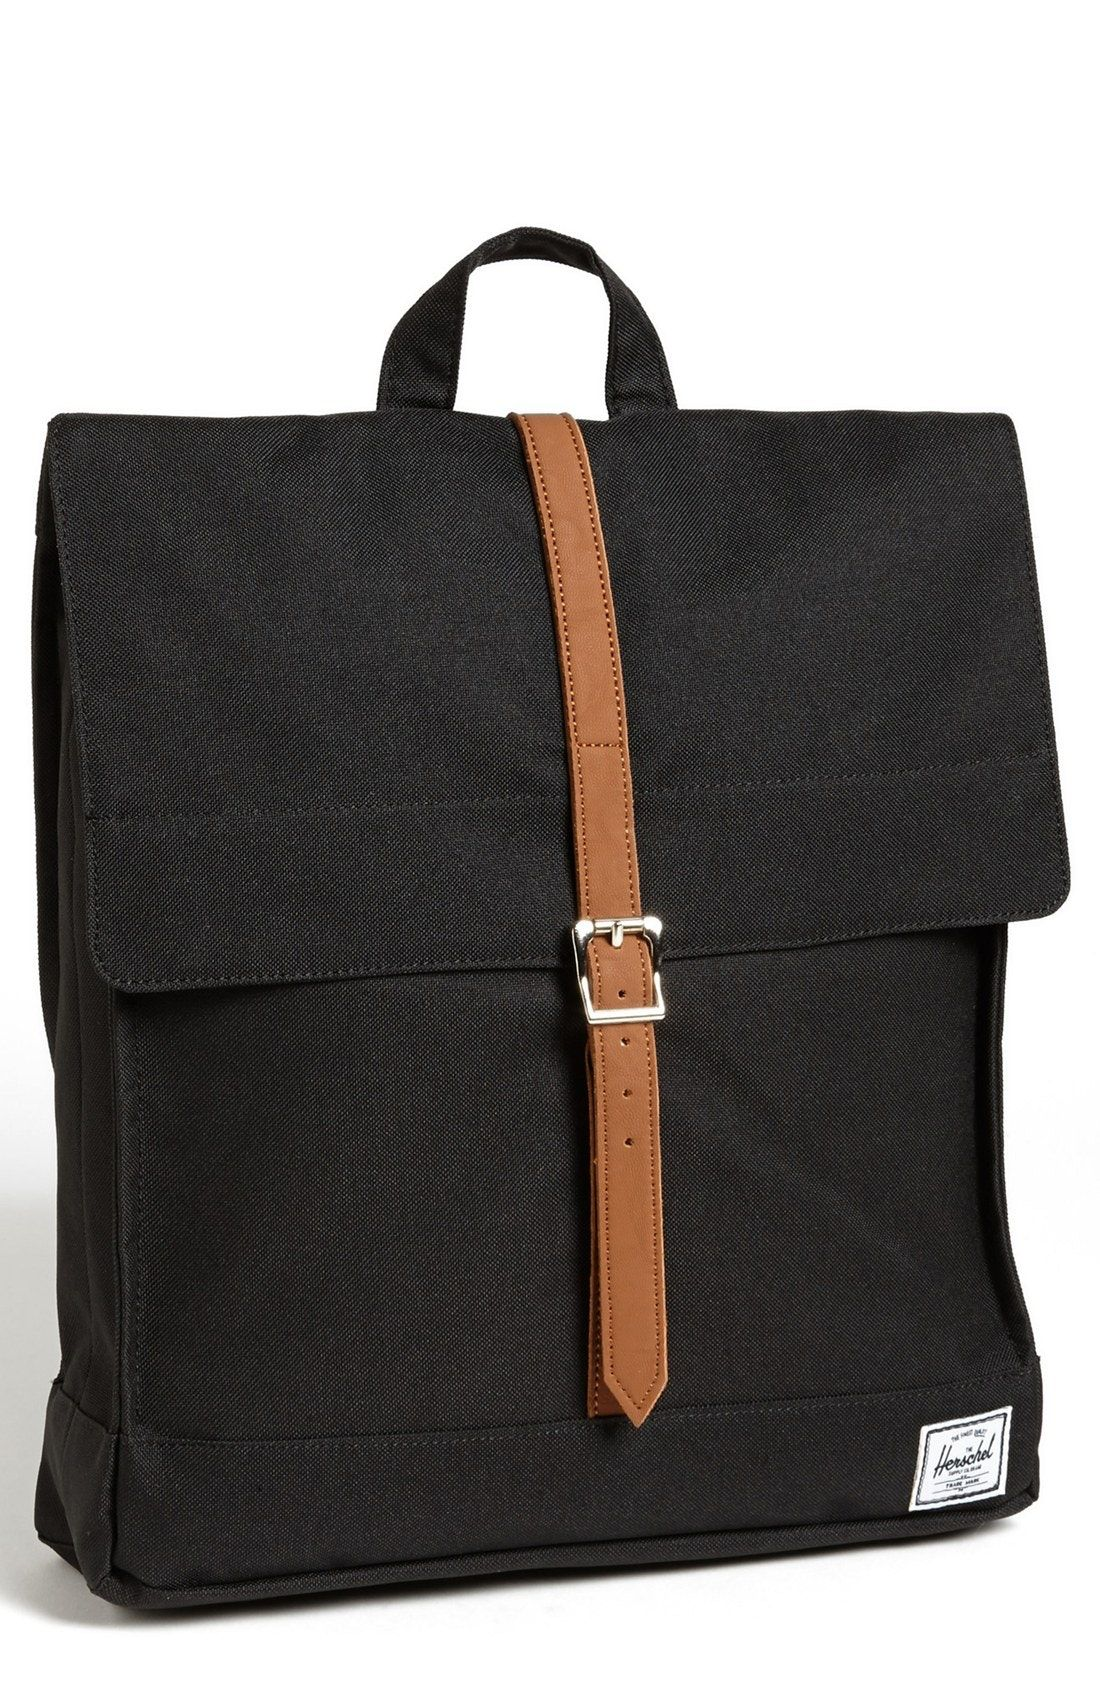 New Herschel Supply Co. City - Mid Volume Backpack fashion online.   55    shop.seehandbags   d8998cfb3b48b